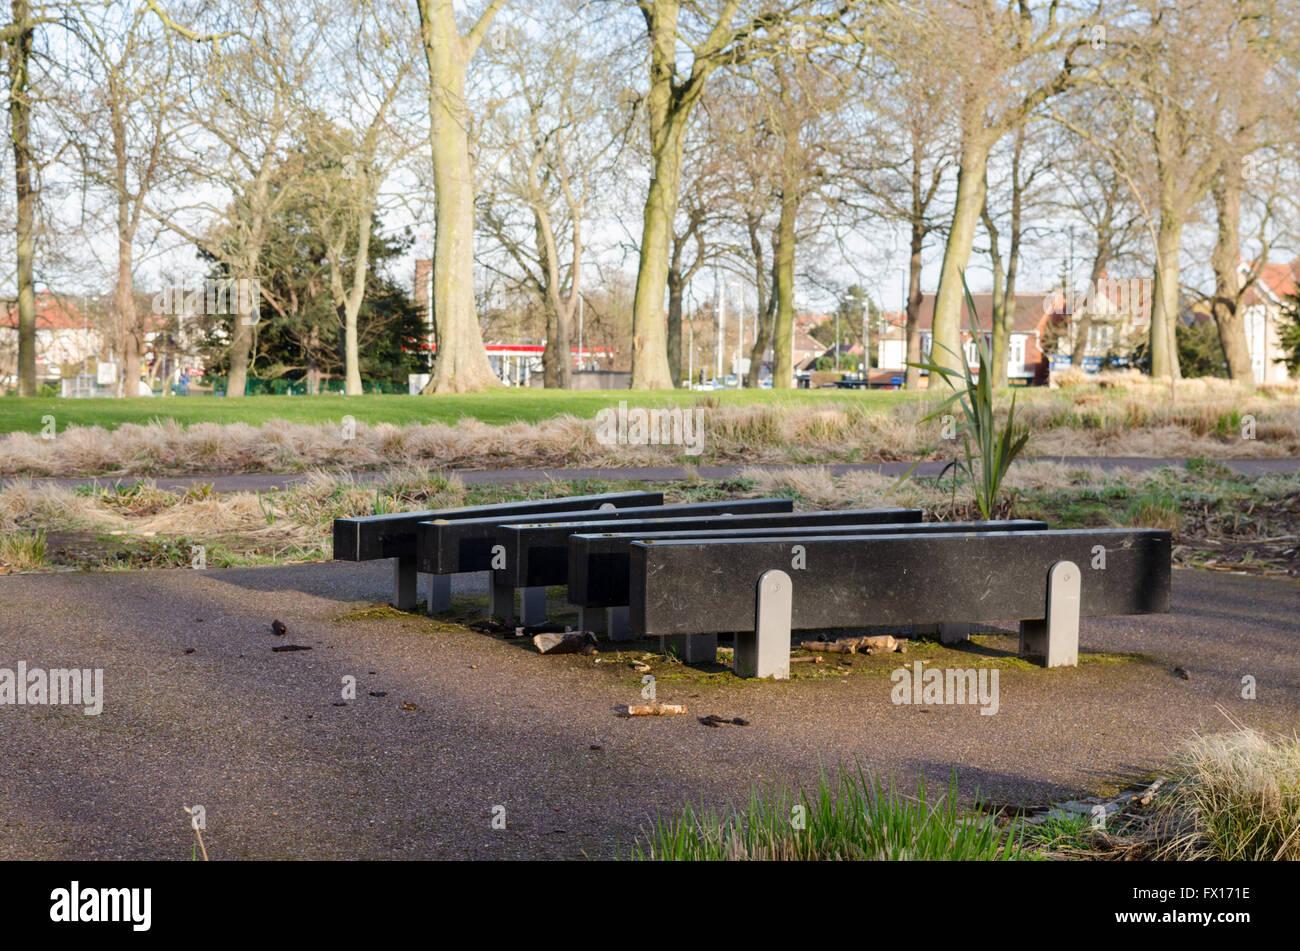 Large U0027Step Onu0027 Xylophone In U0027The Sensory Gardenu0027 At Barnes Park, Sunderland